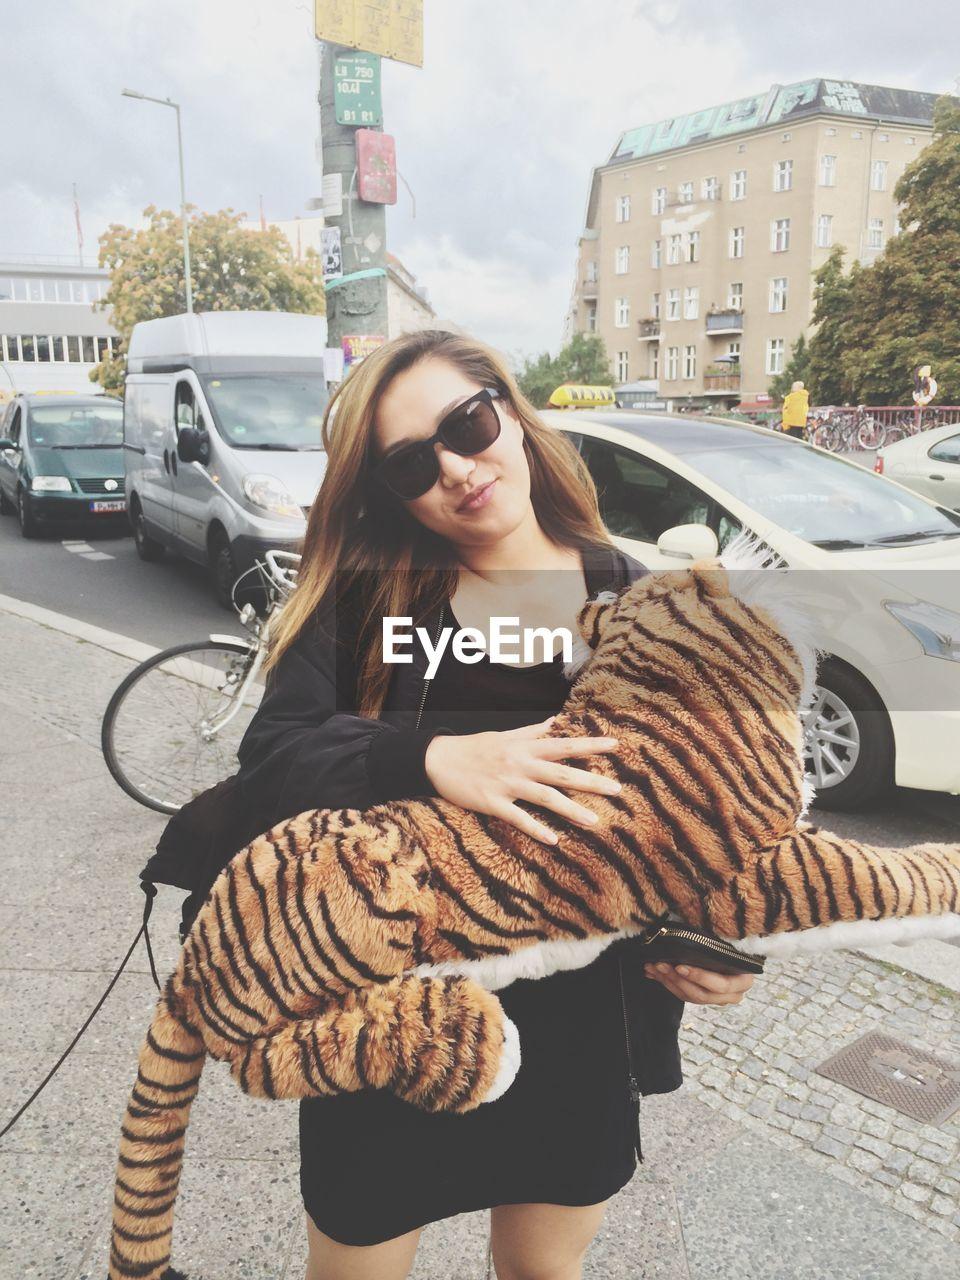 Portrait Of Woman Holding Tiger Stuffed Toy On Sidewalk